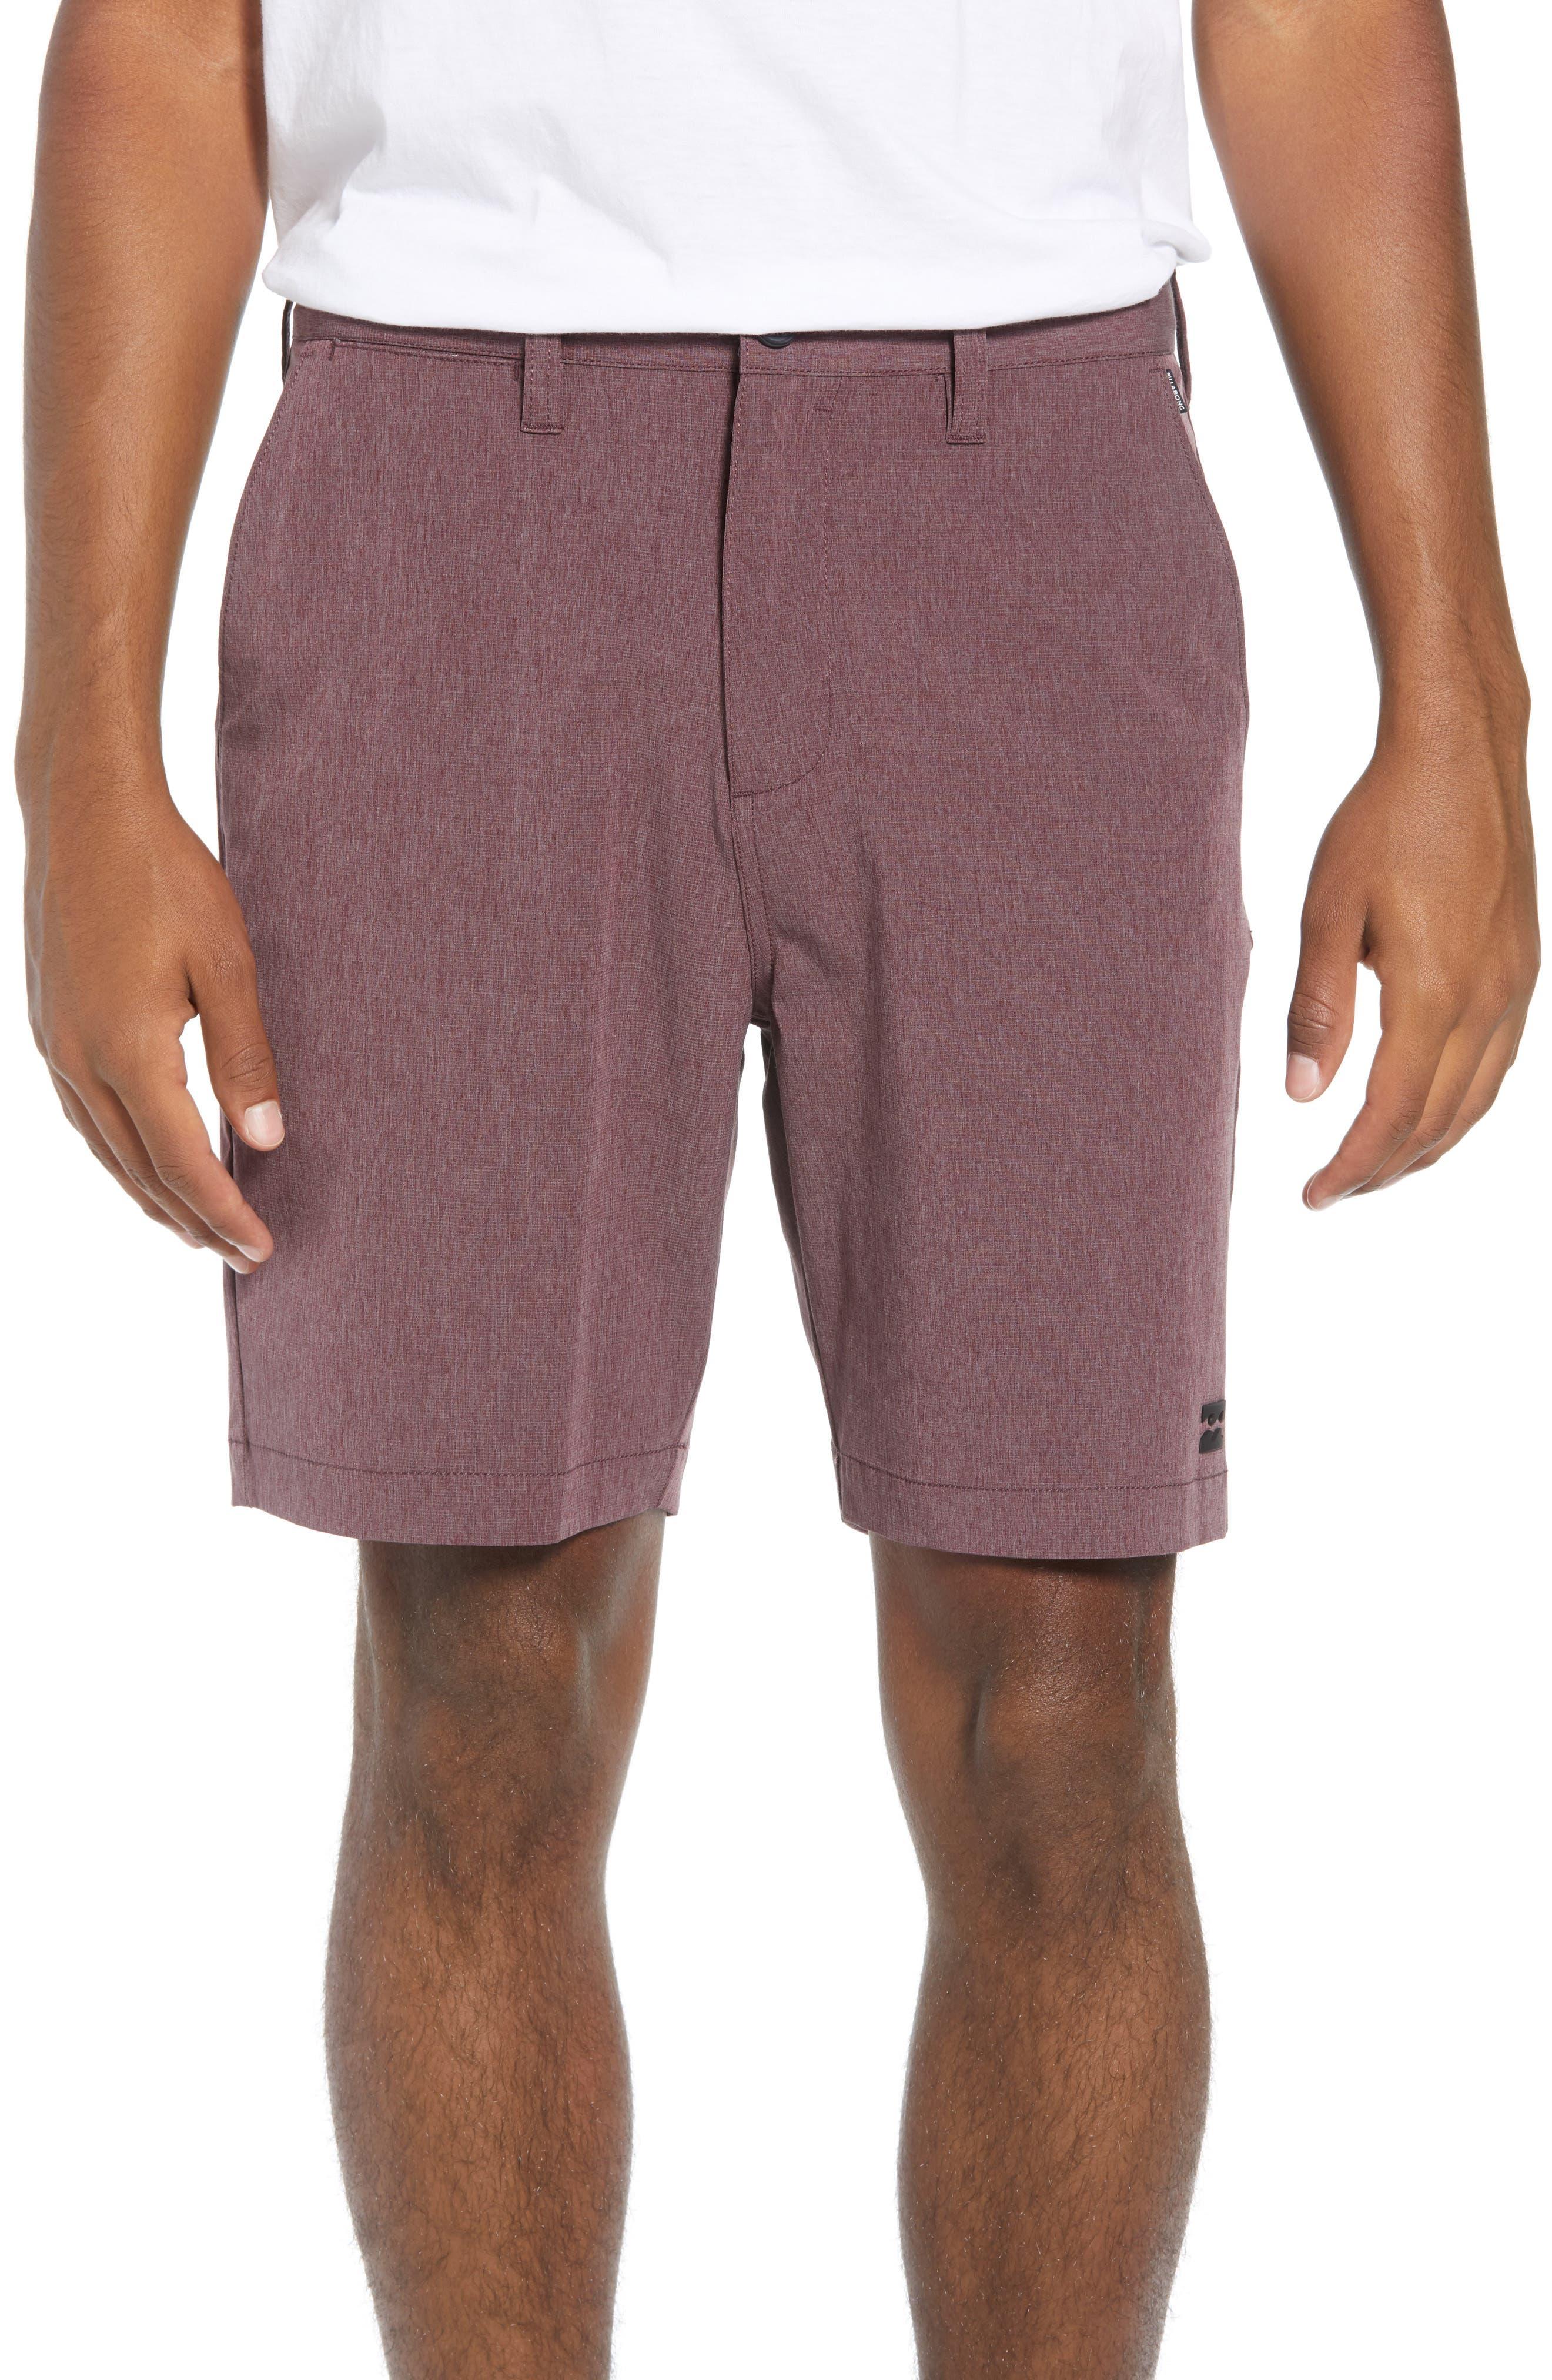 Billabong Crossfire X Mid-Length Shorts, Burgundy